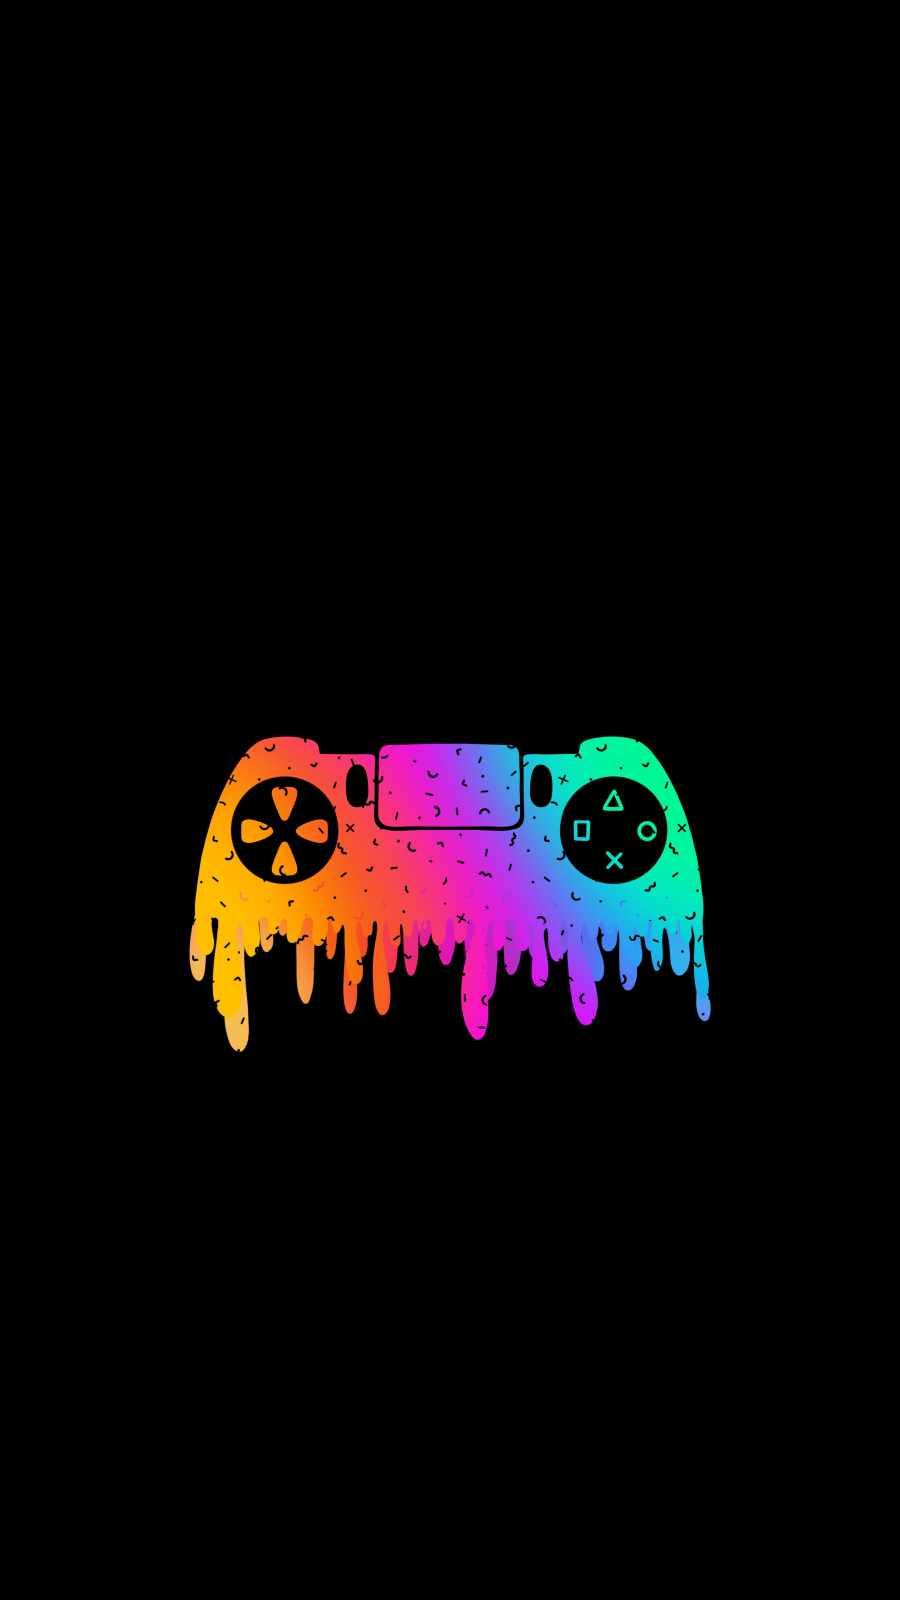 Amoled Gamer iPhone Wallpaper